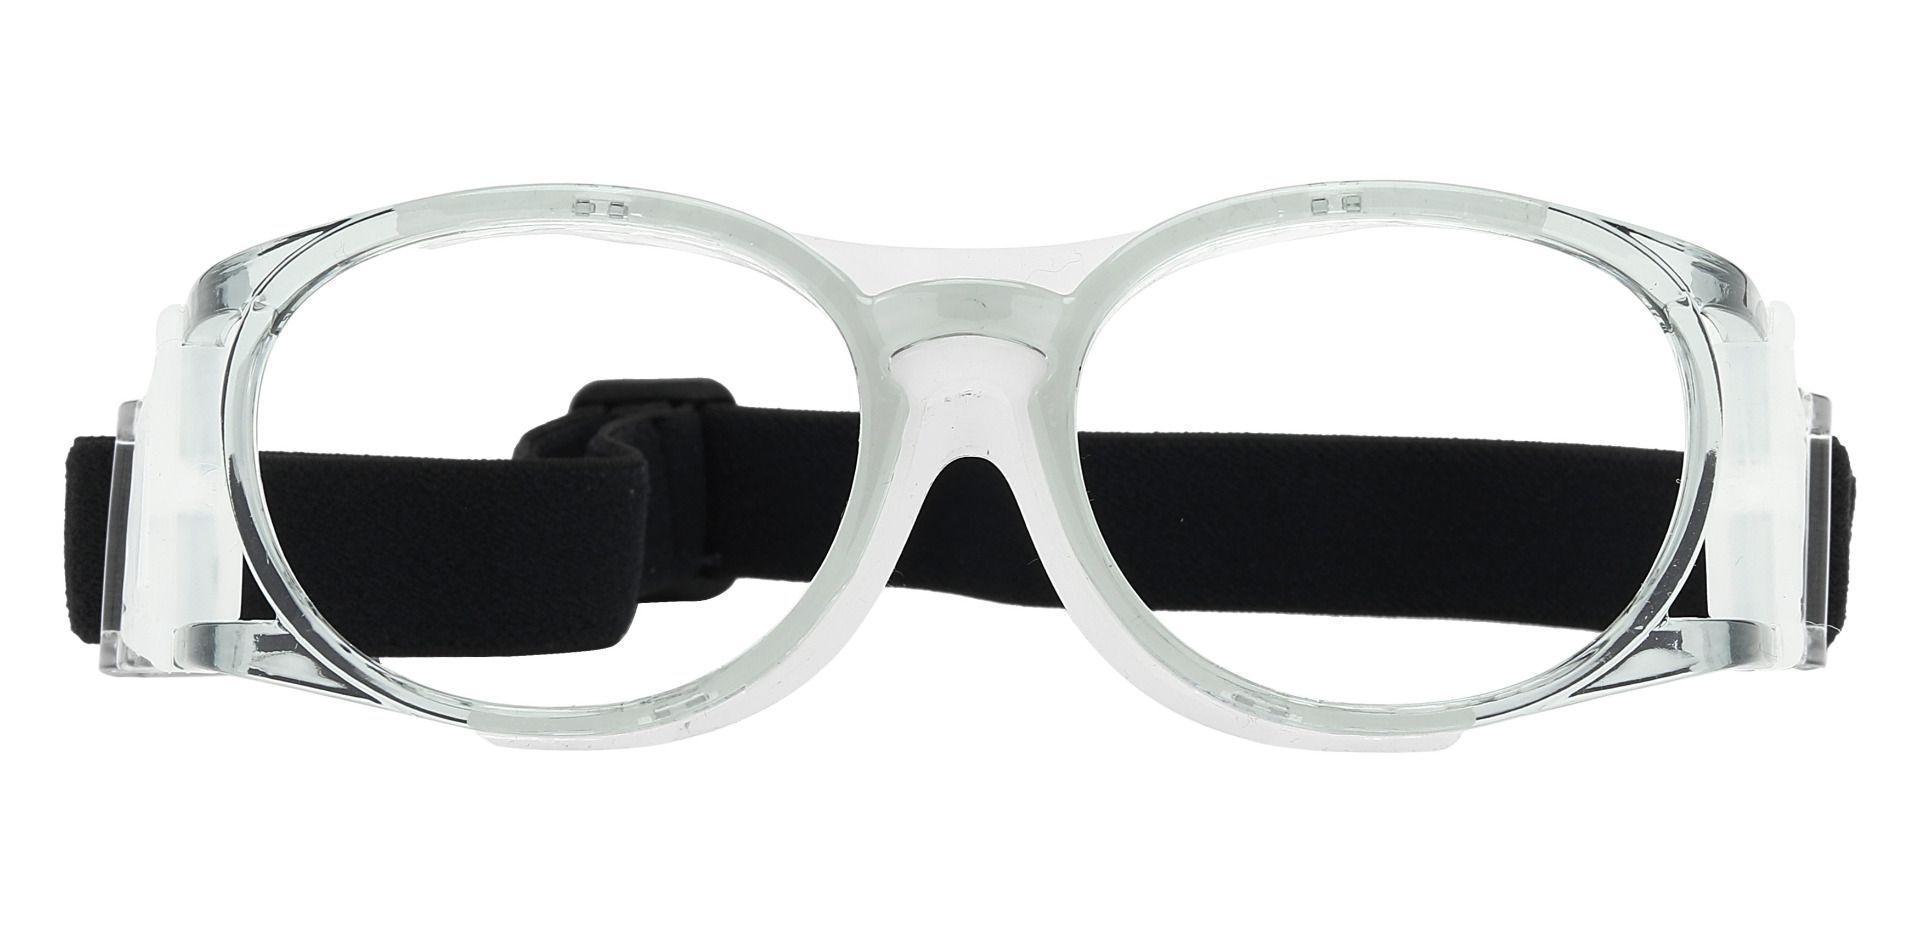 Joliet Sports Goggles Prescription Glasses - Gray